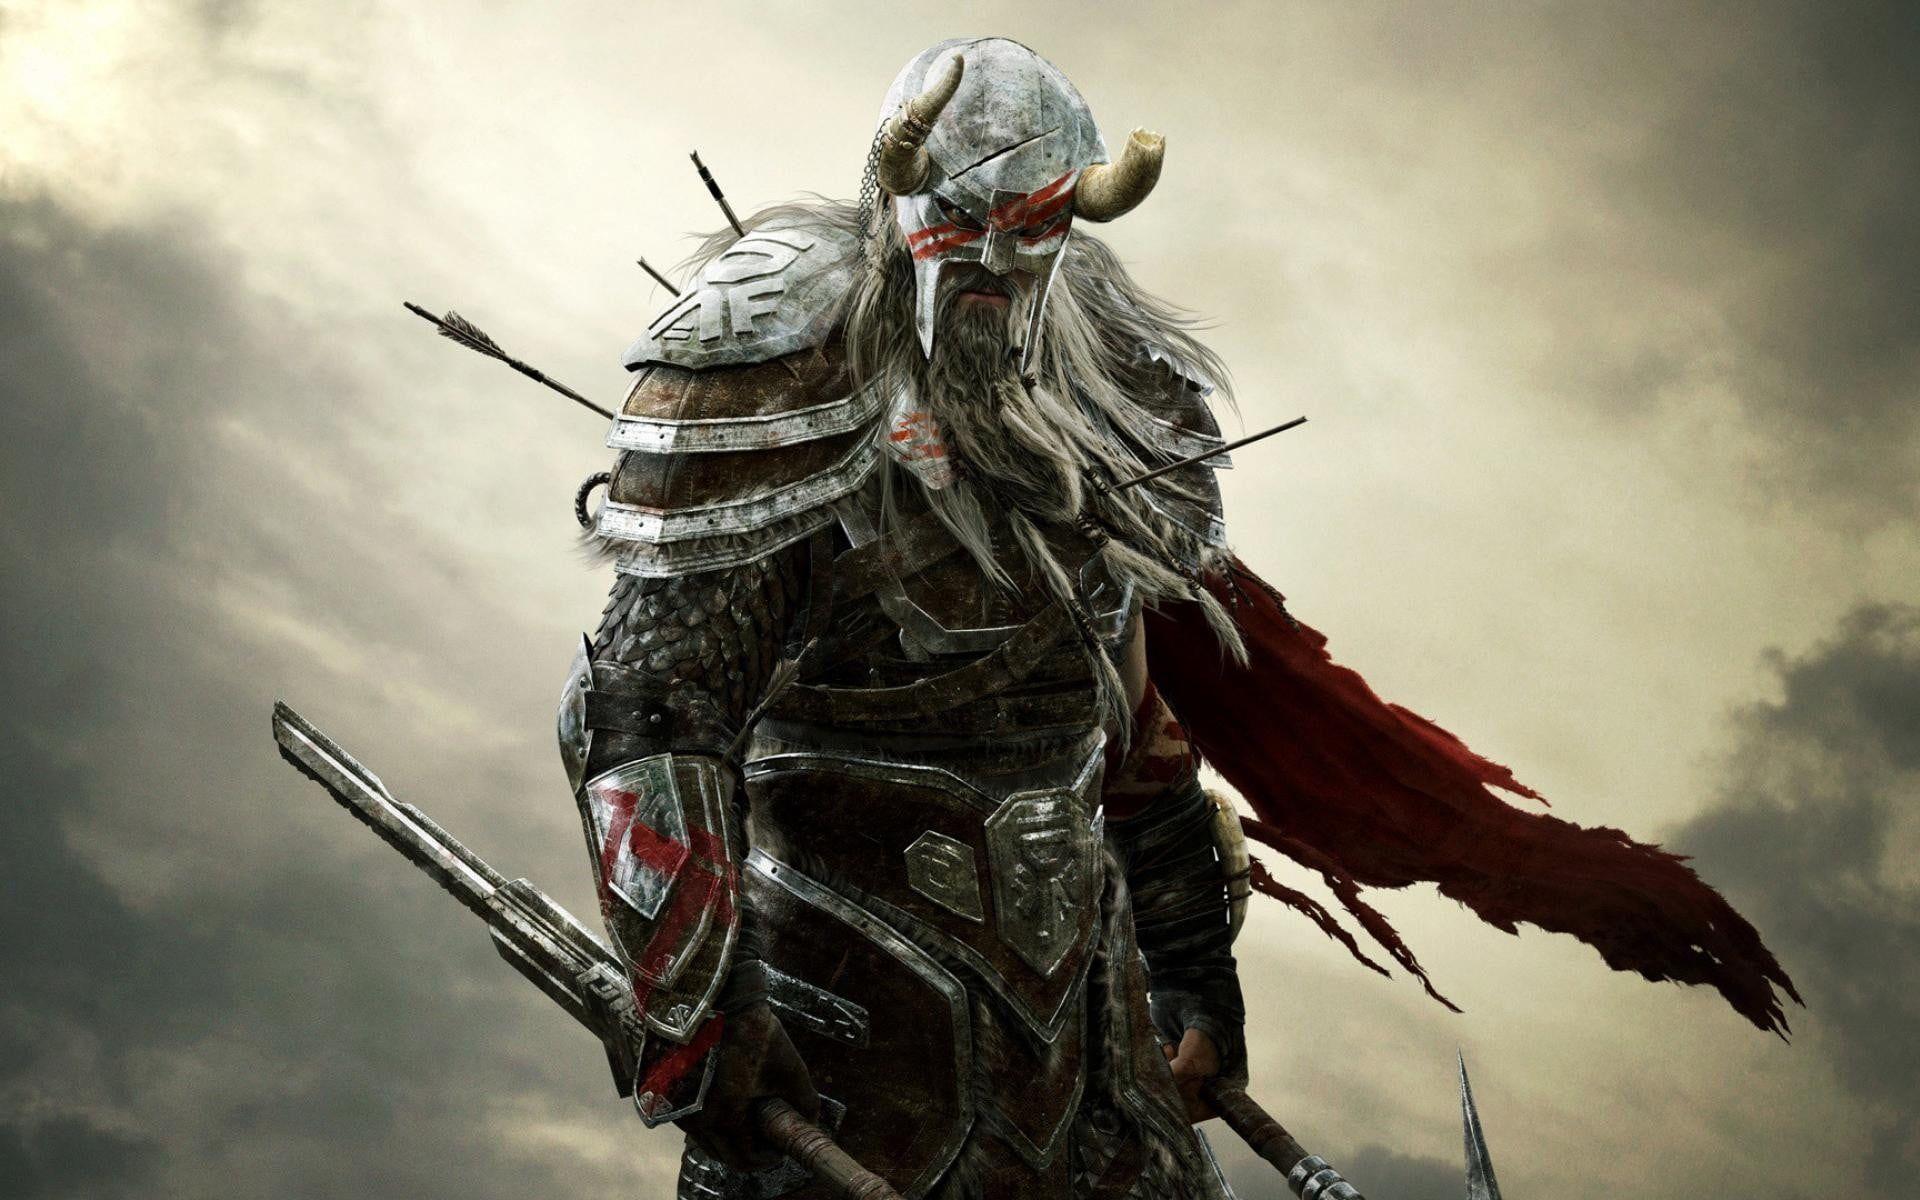 Nord Elder Scrolls Wallpaper Video Games The Elder Scrolls Online The Elder Scrolls Fantasy Art Warrior 1 Elder Scrolls Elder Scrolls Online Skyrim Wallpaper